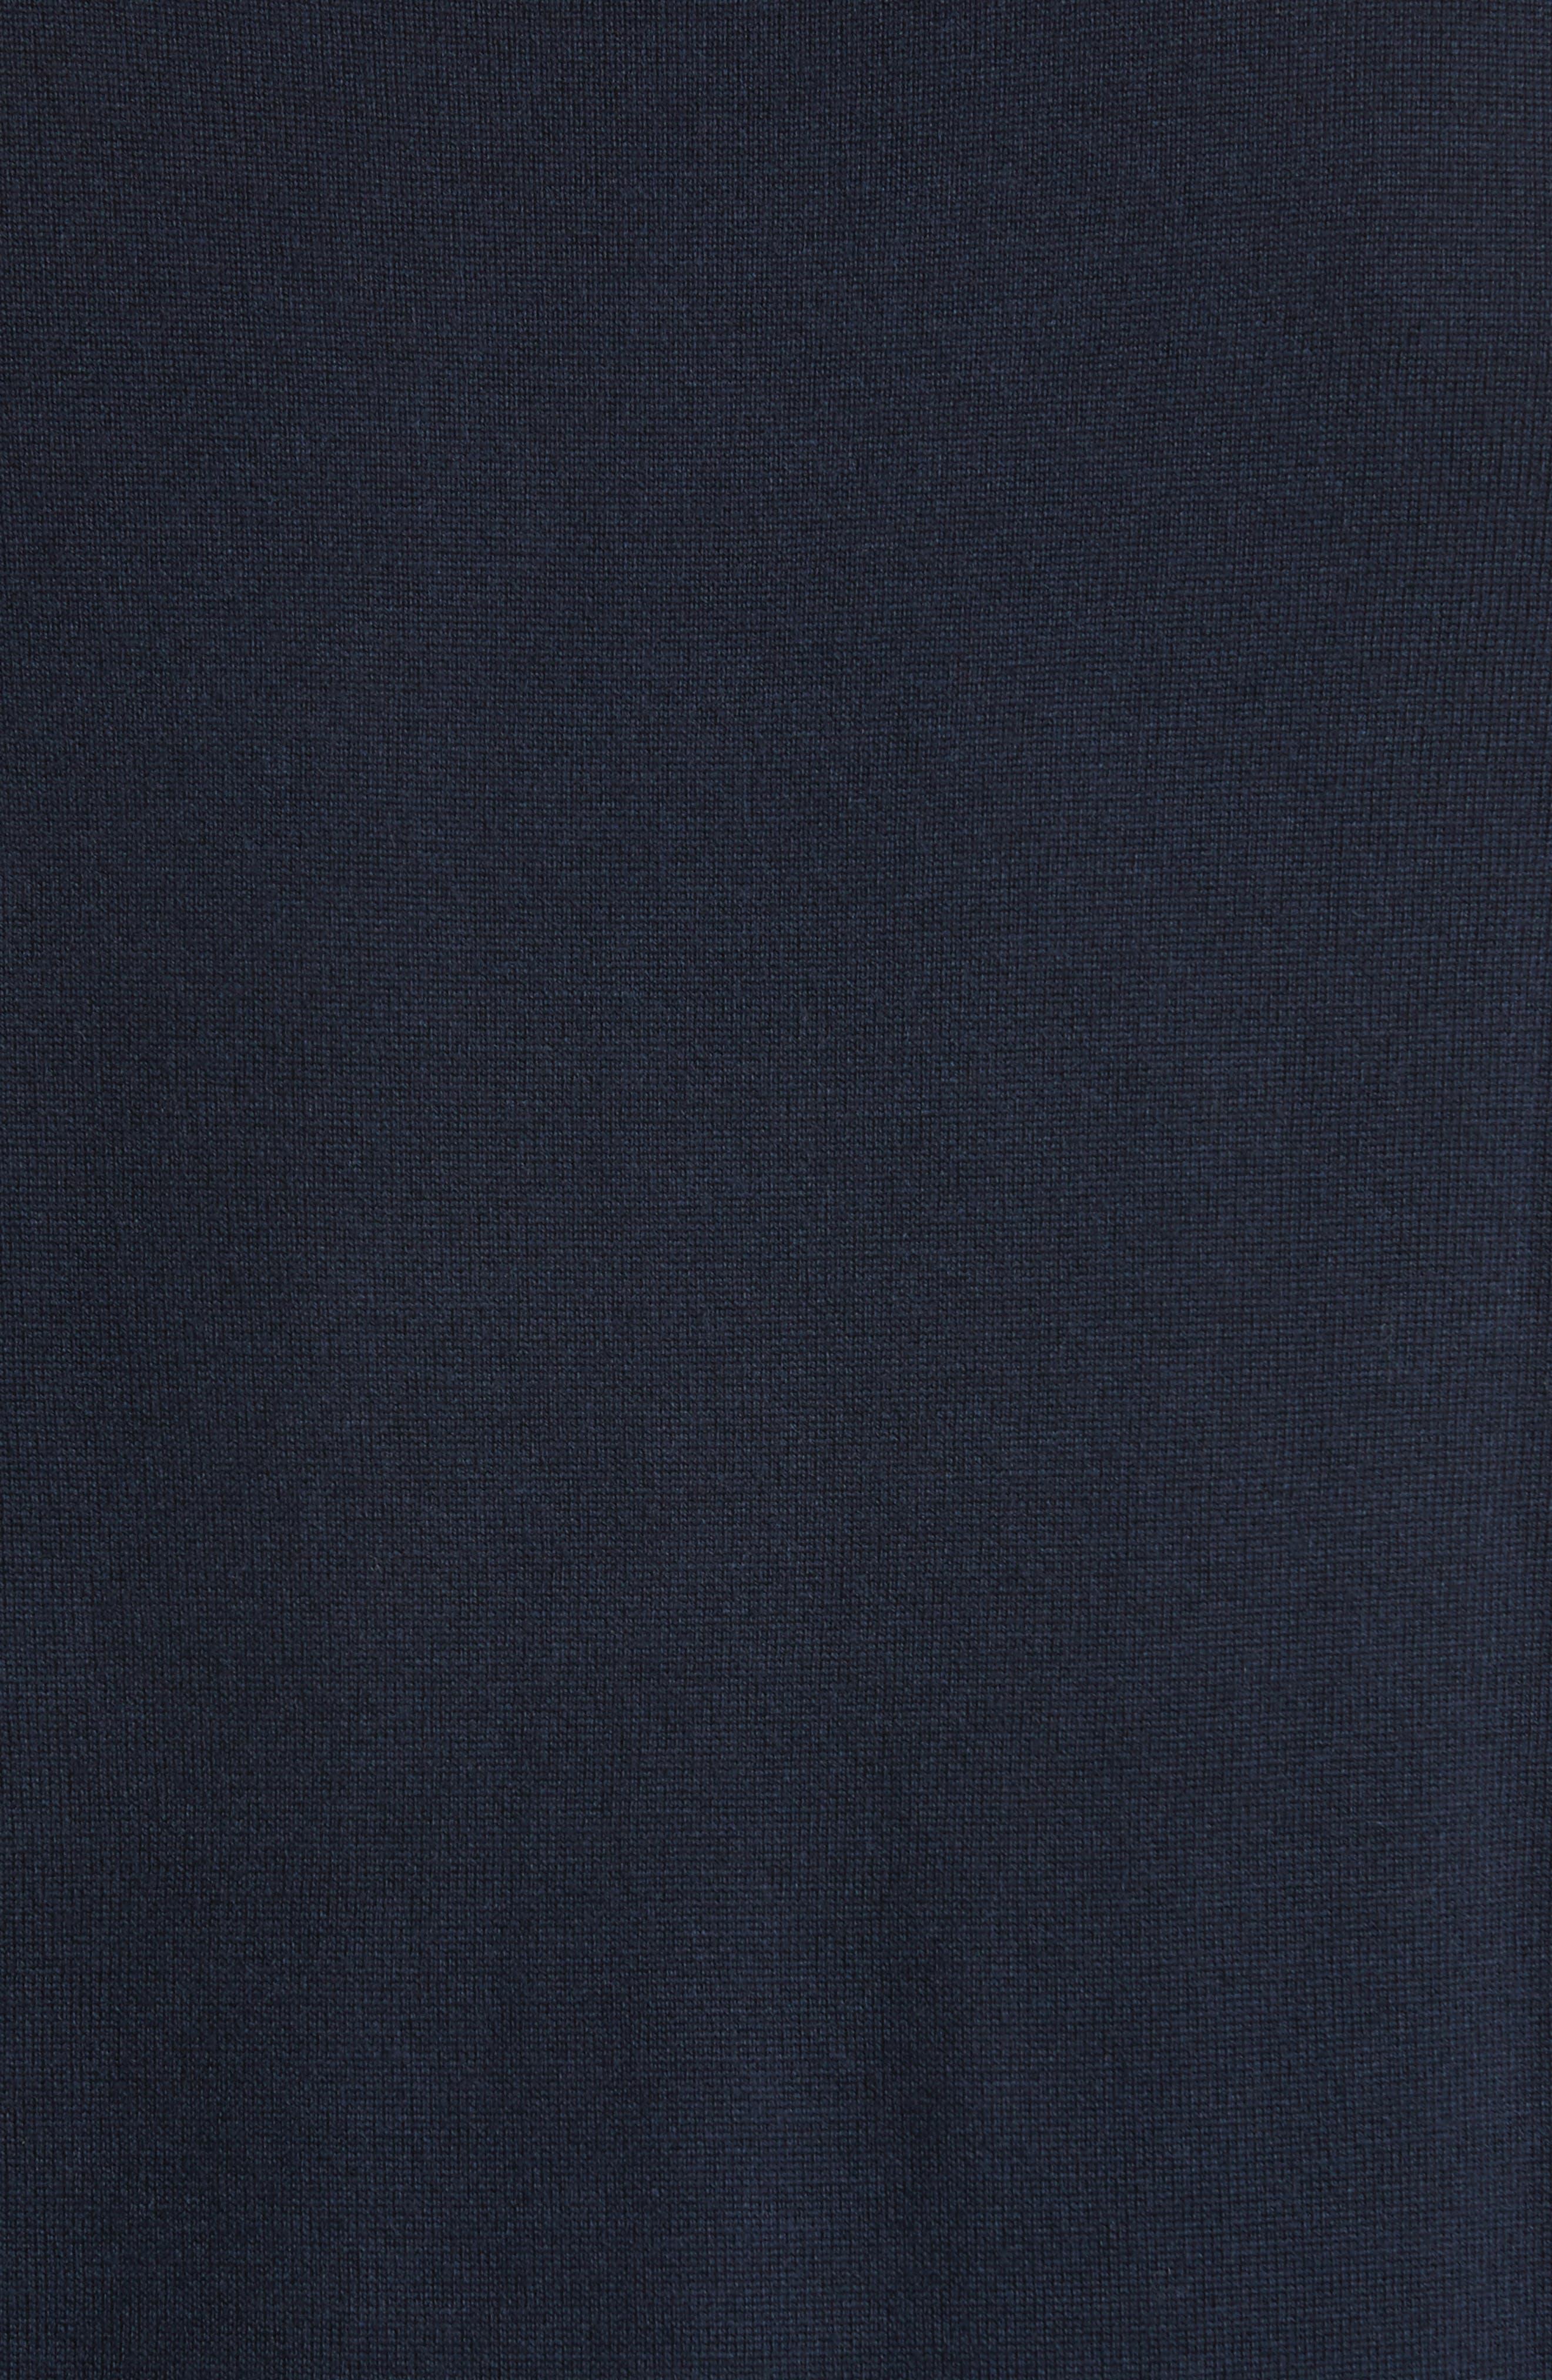 Carter Merino Wool Crewneck Sweater,                             Alternate thumbnail 15, color,